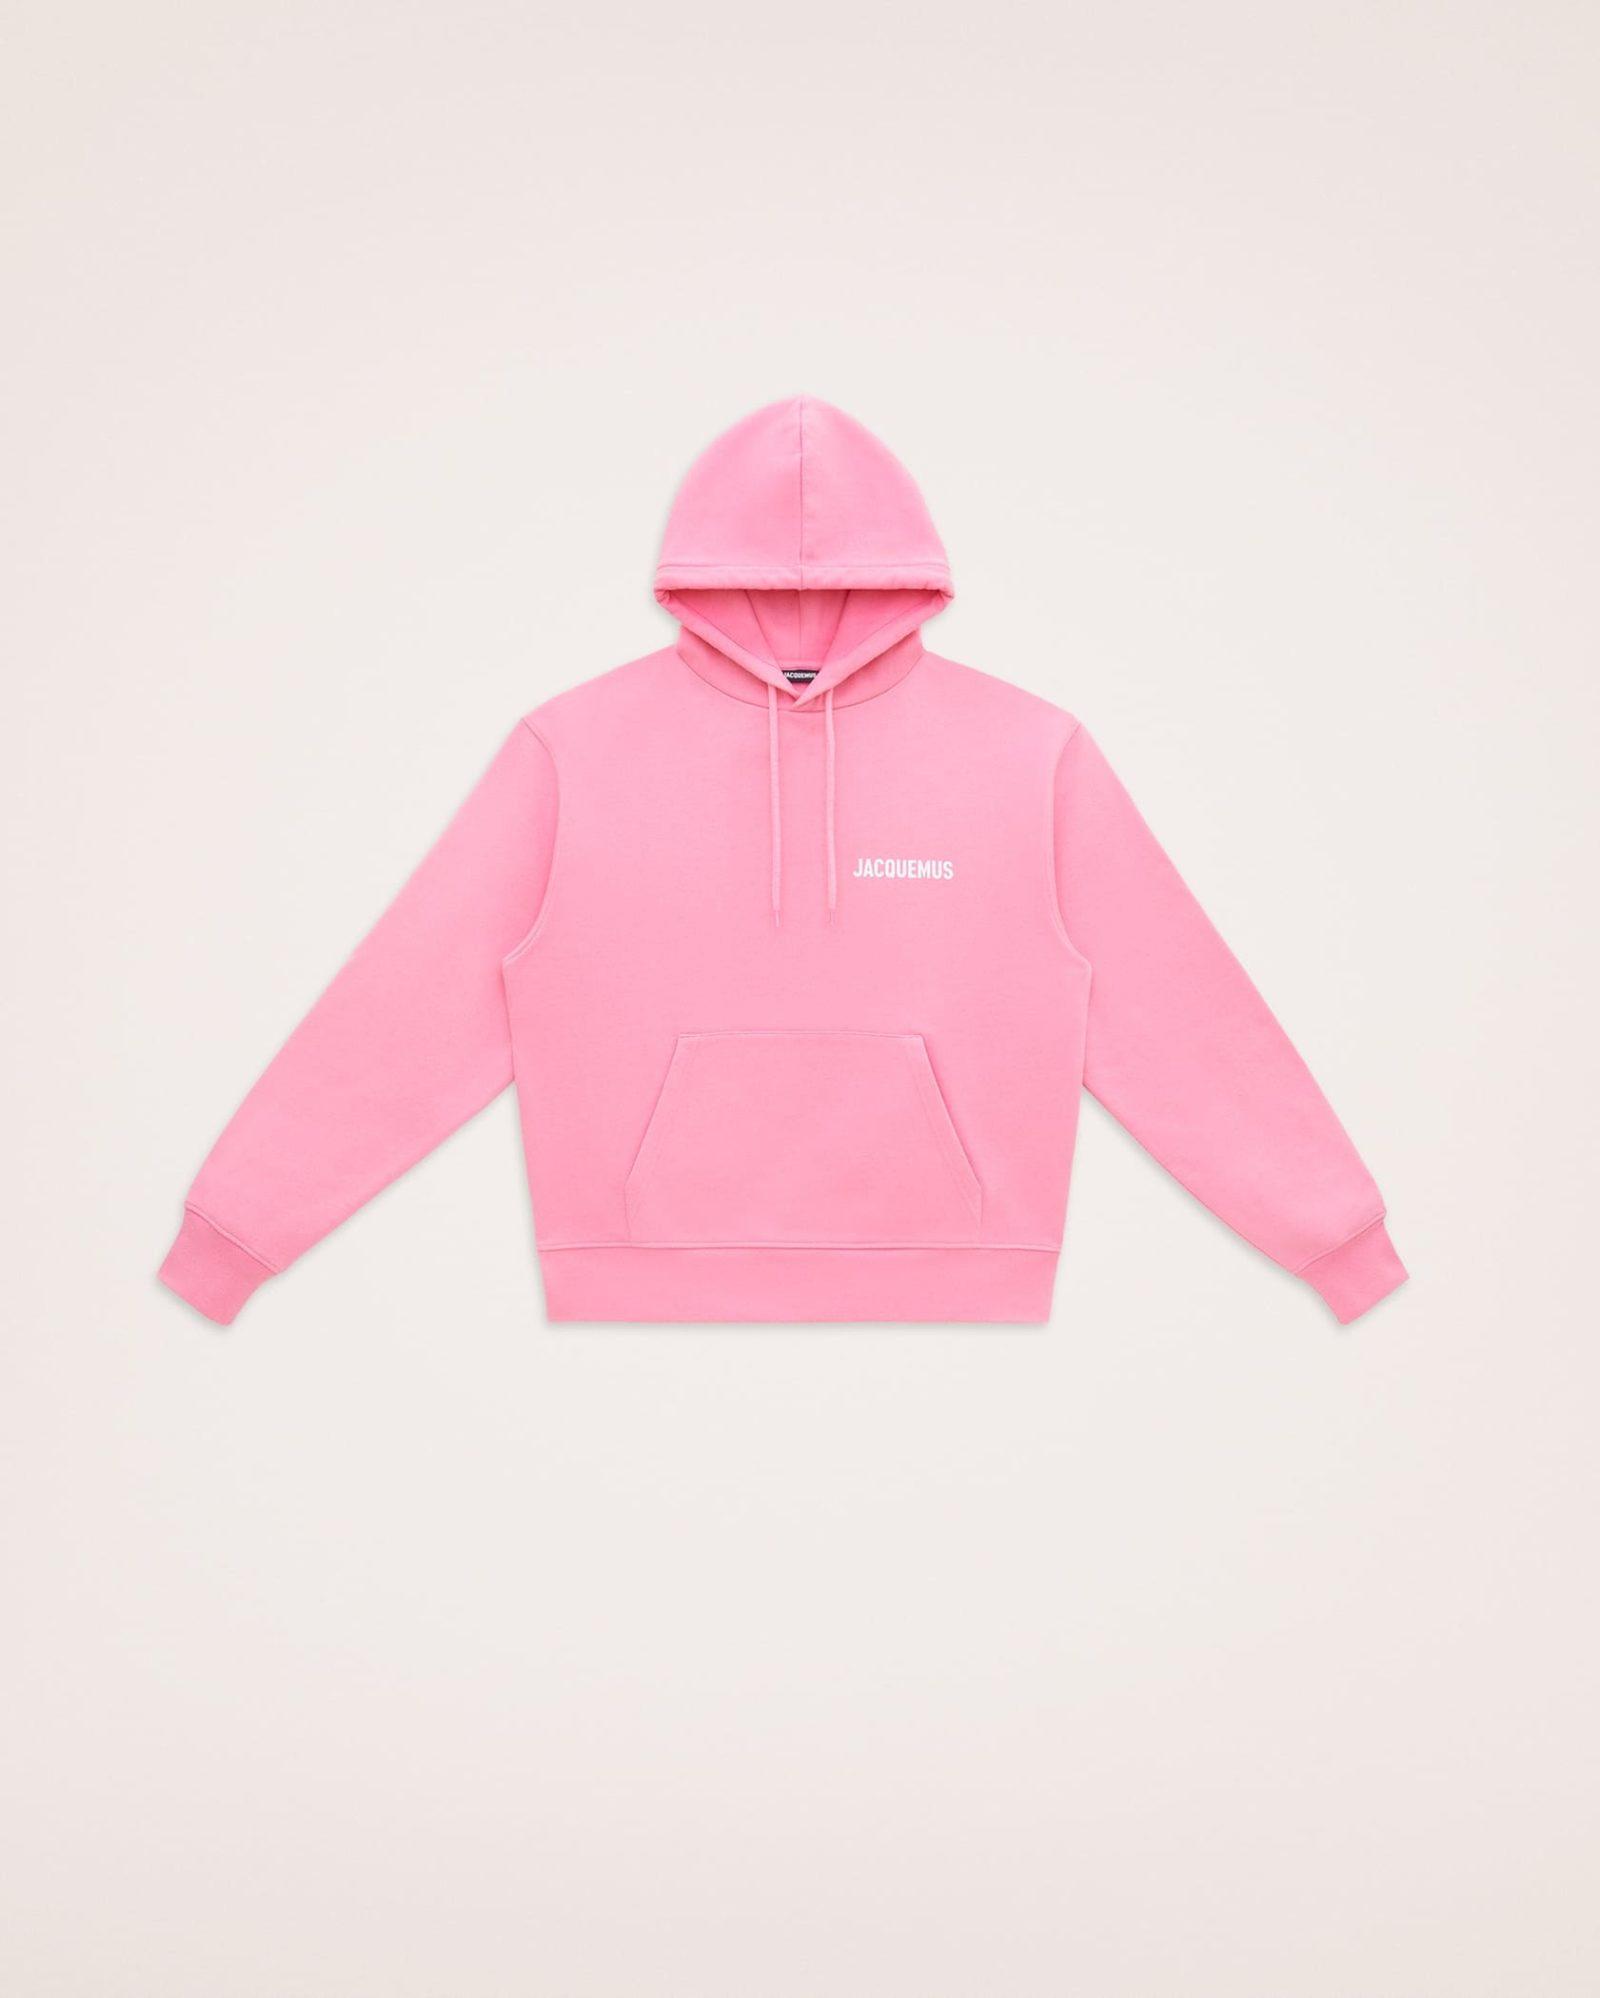 Jaquemus Pink